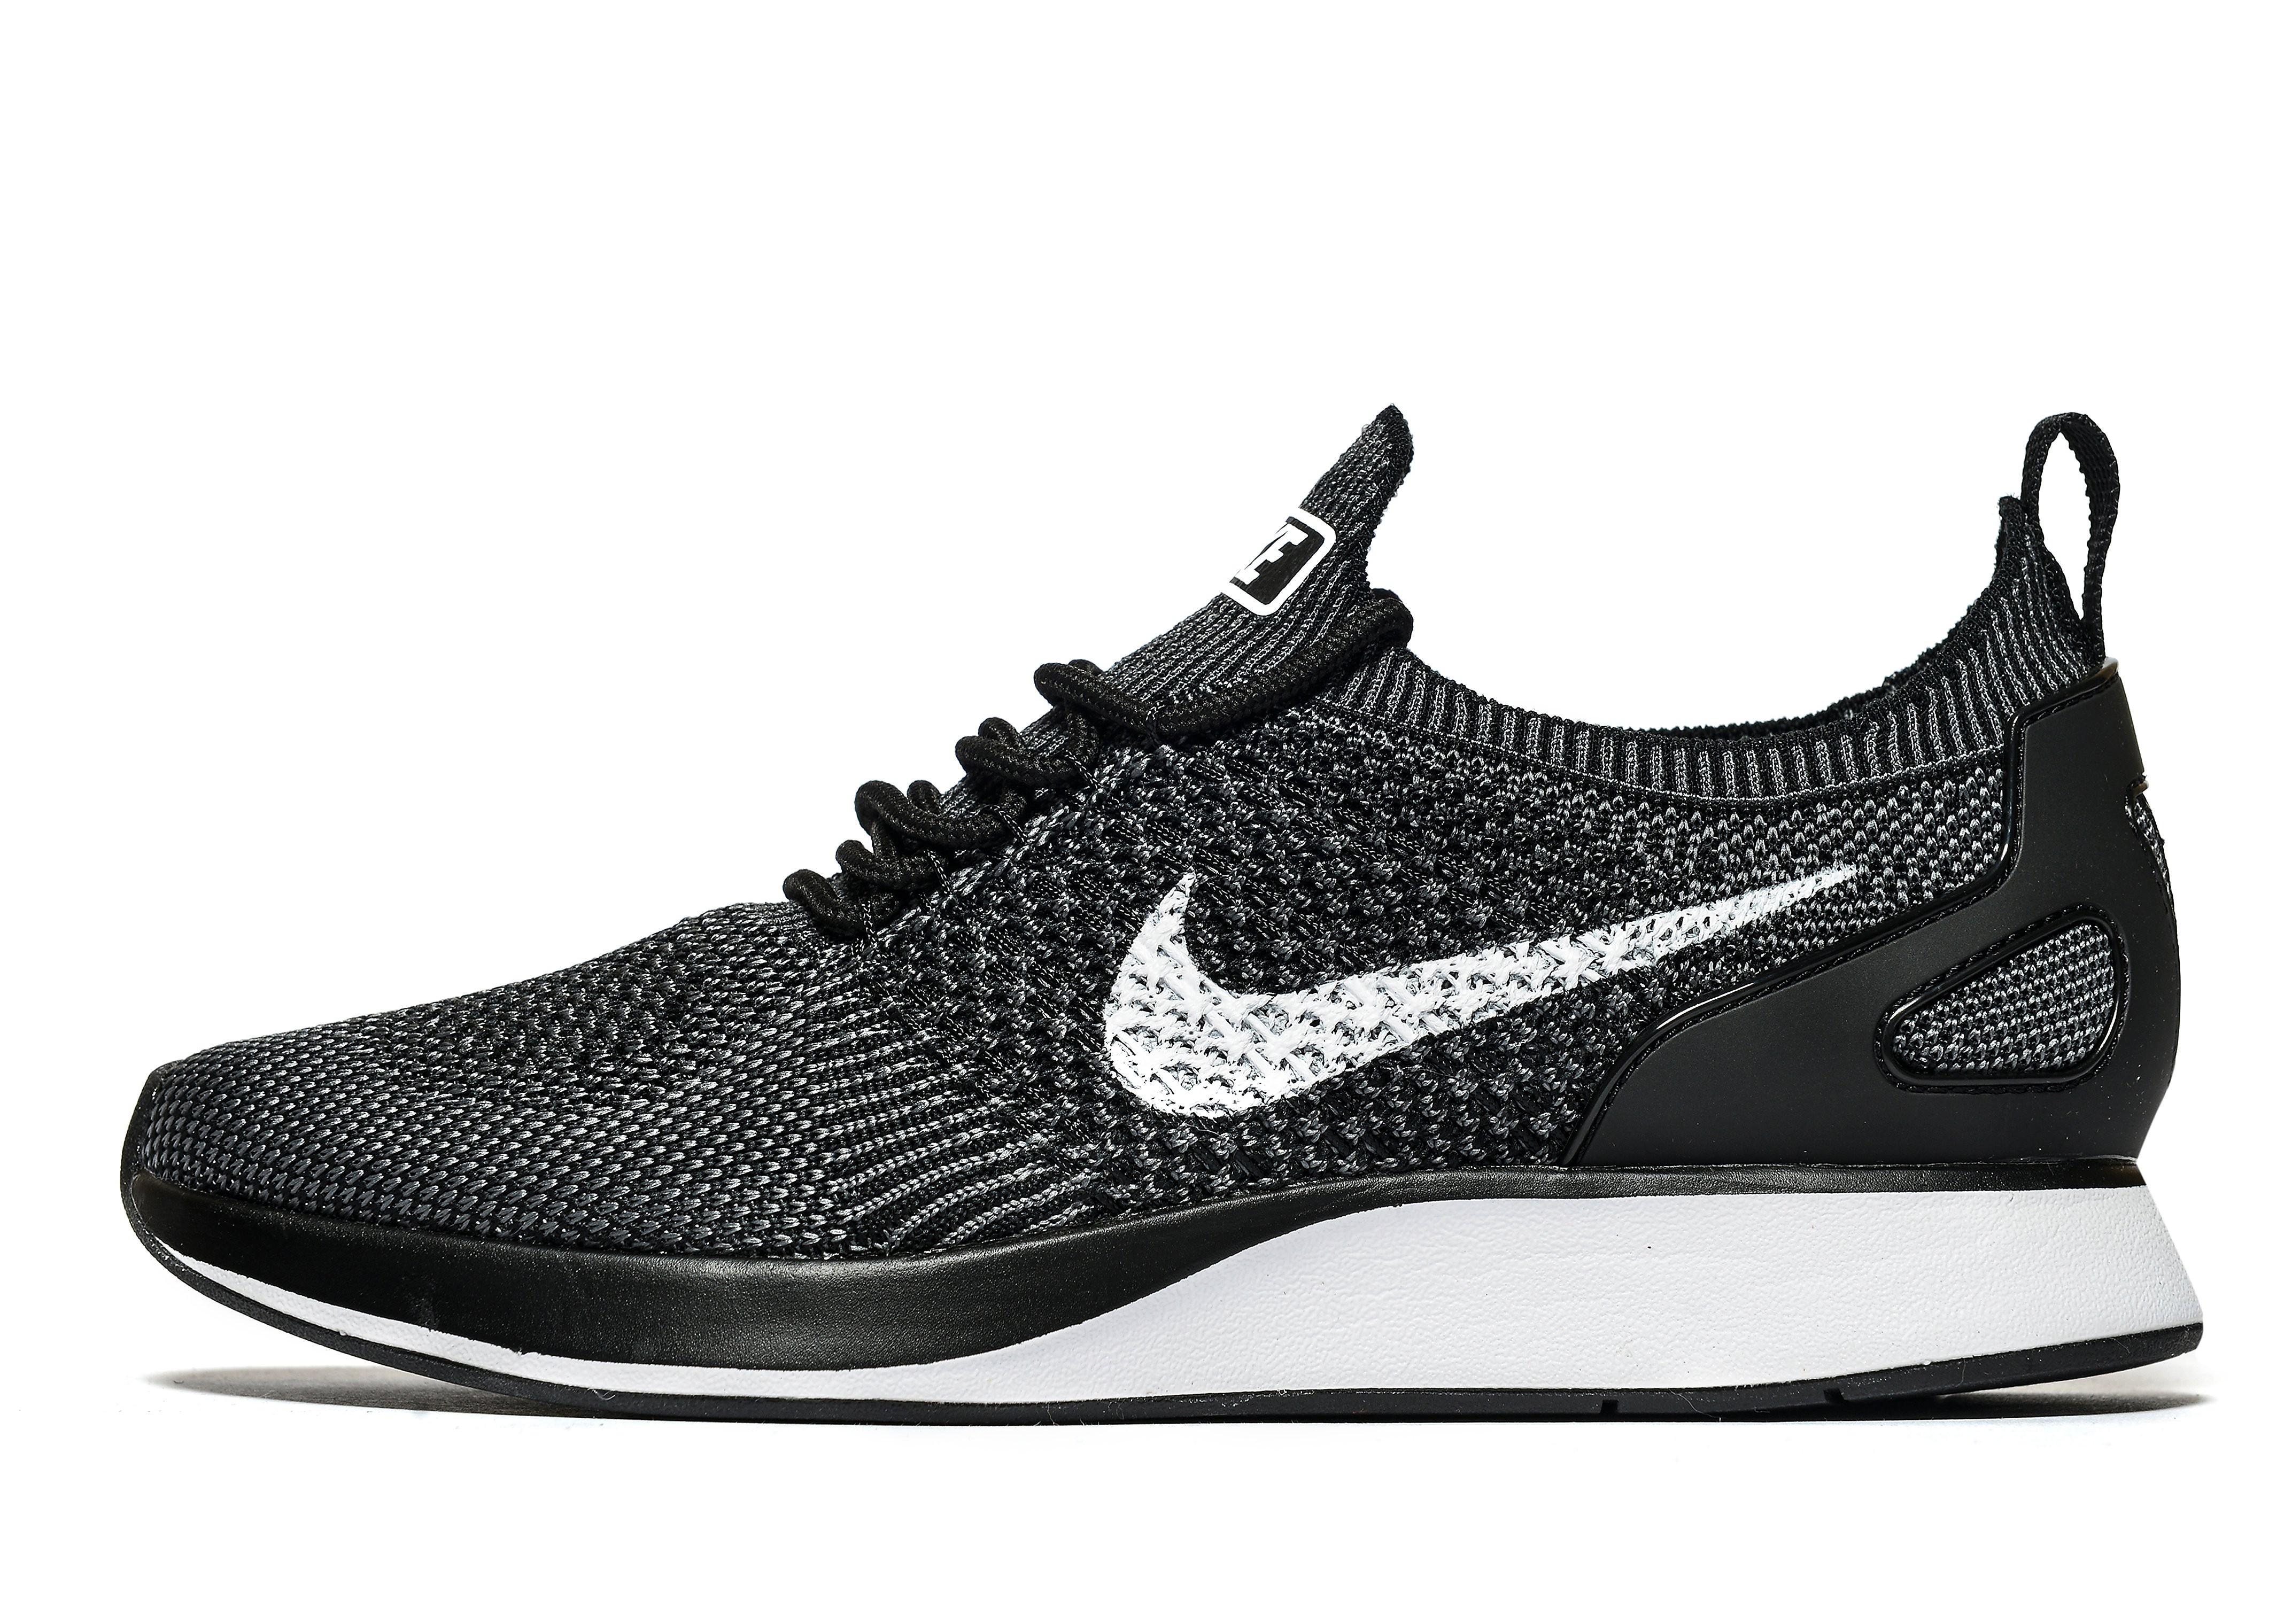 Nike Air Zoom Mariah Racer Flyknit Women's